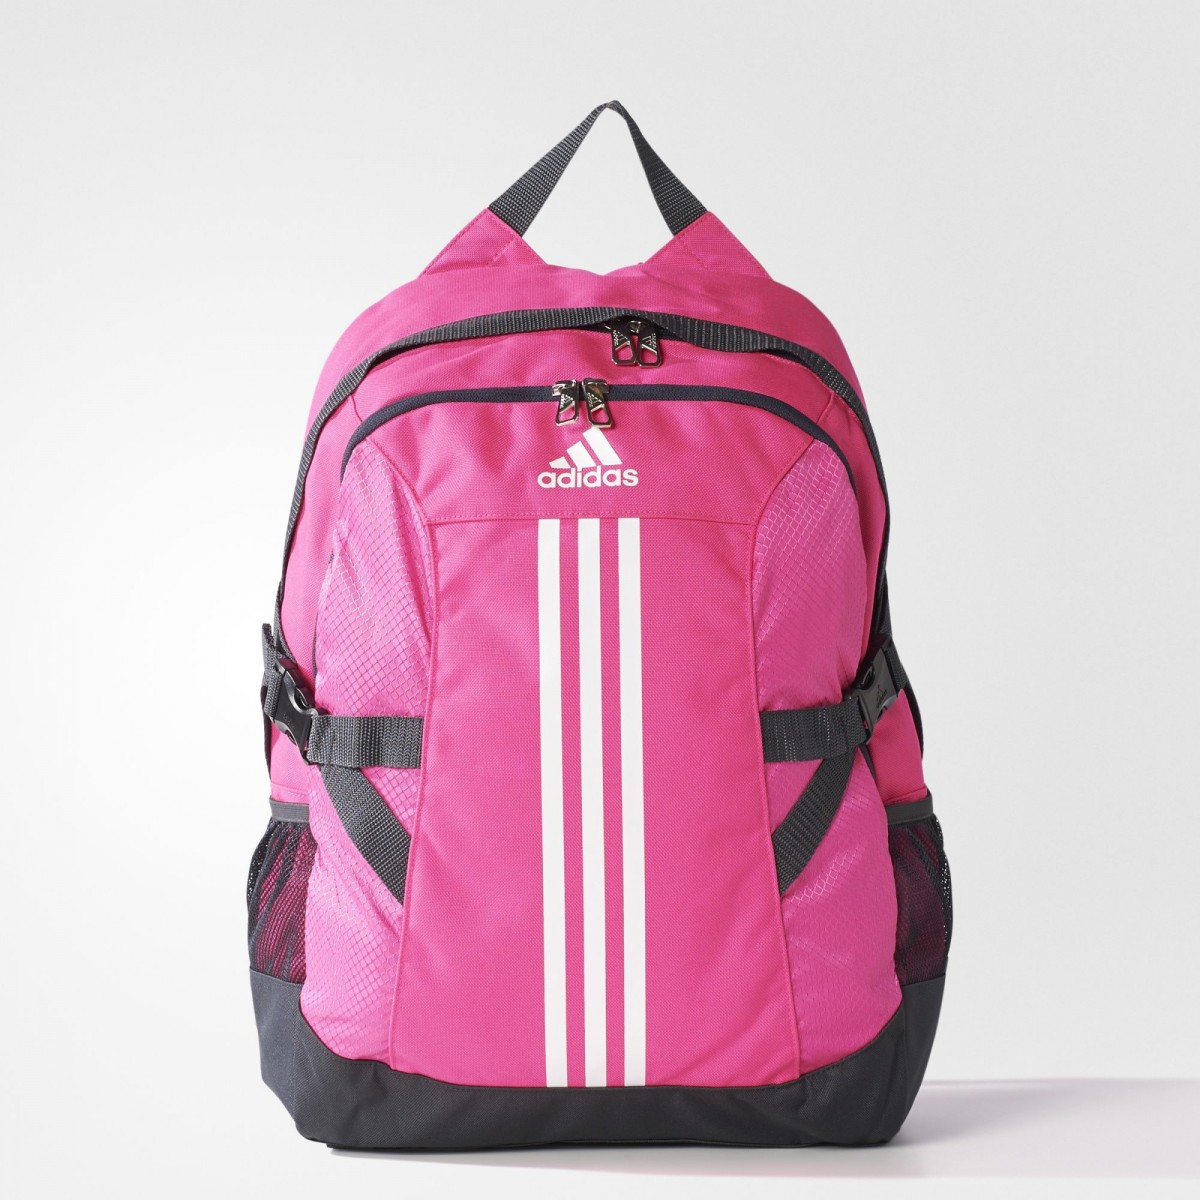 mochila feminina da adidas rosa